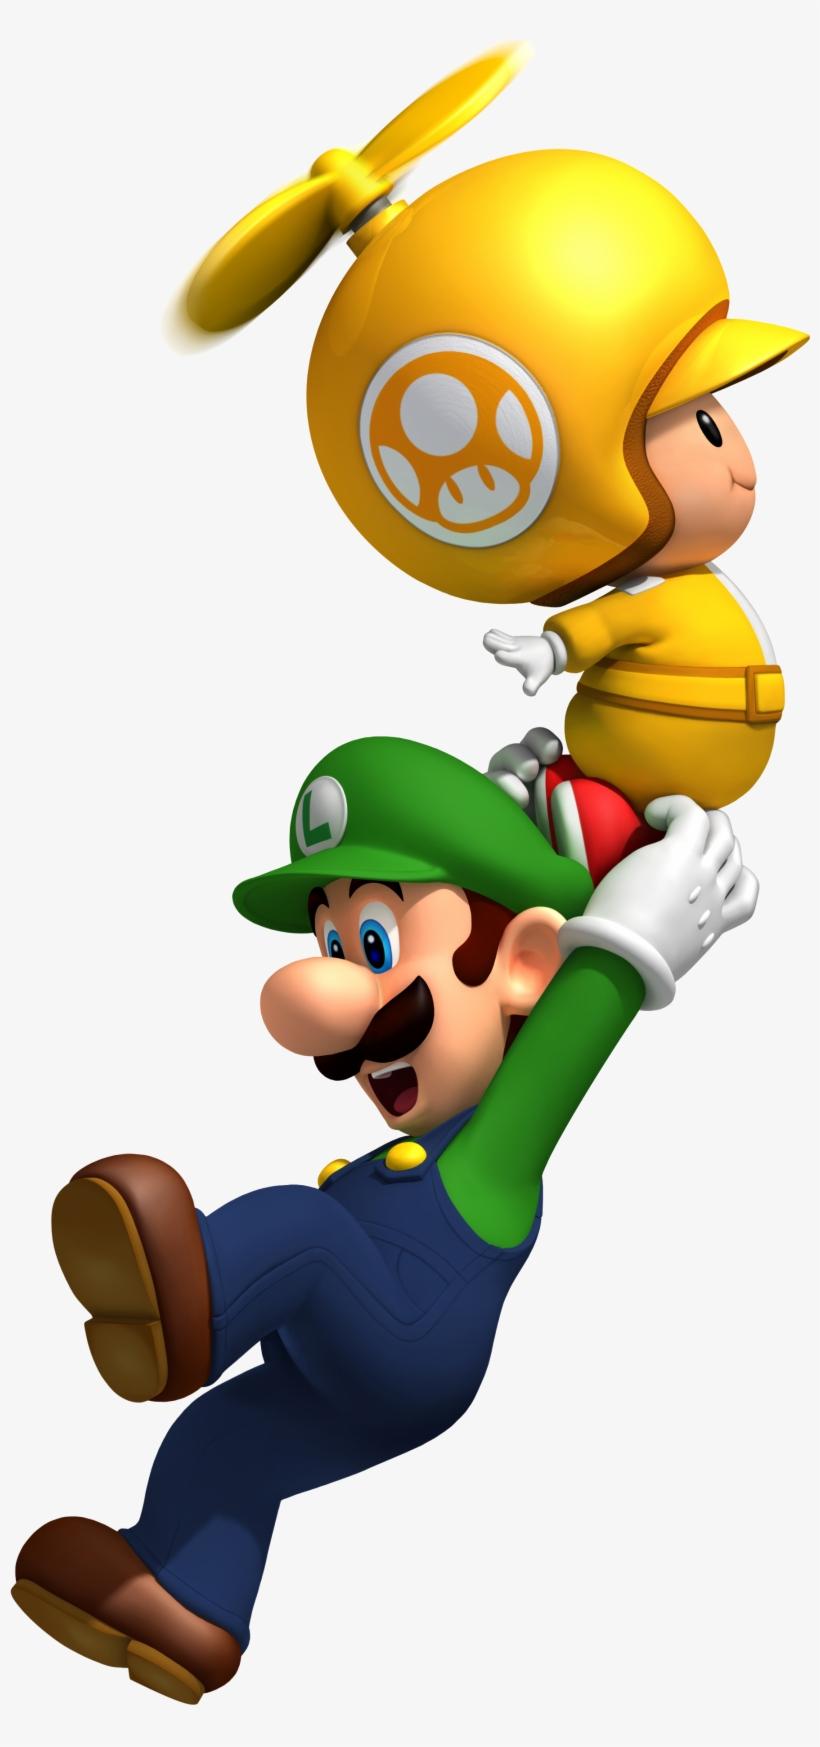 New Super Mario Bros - New Super Mario Bros Wii Png, transparent png #297849